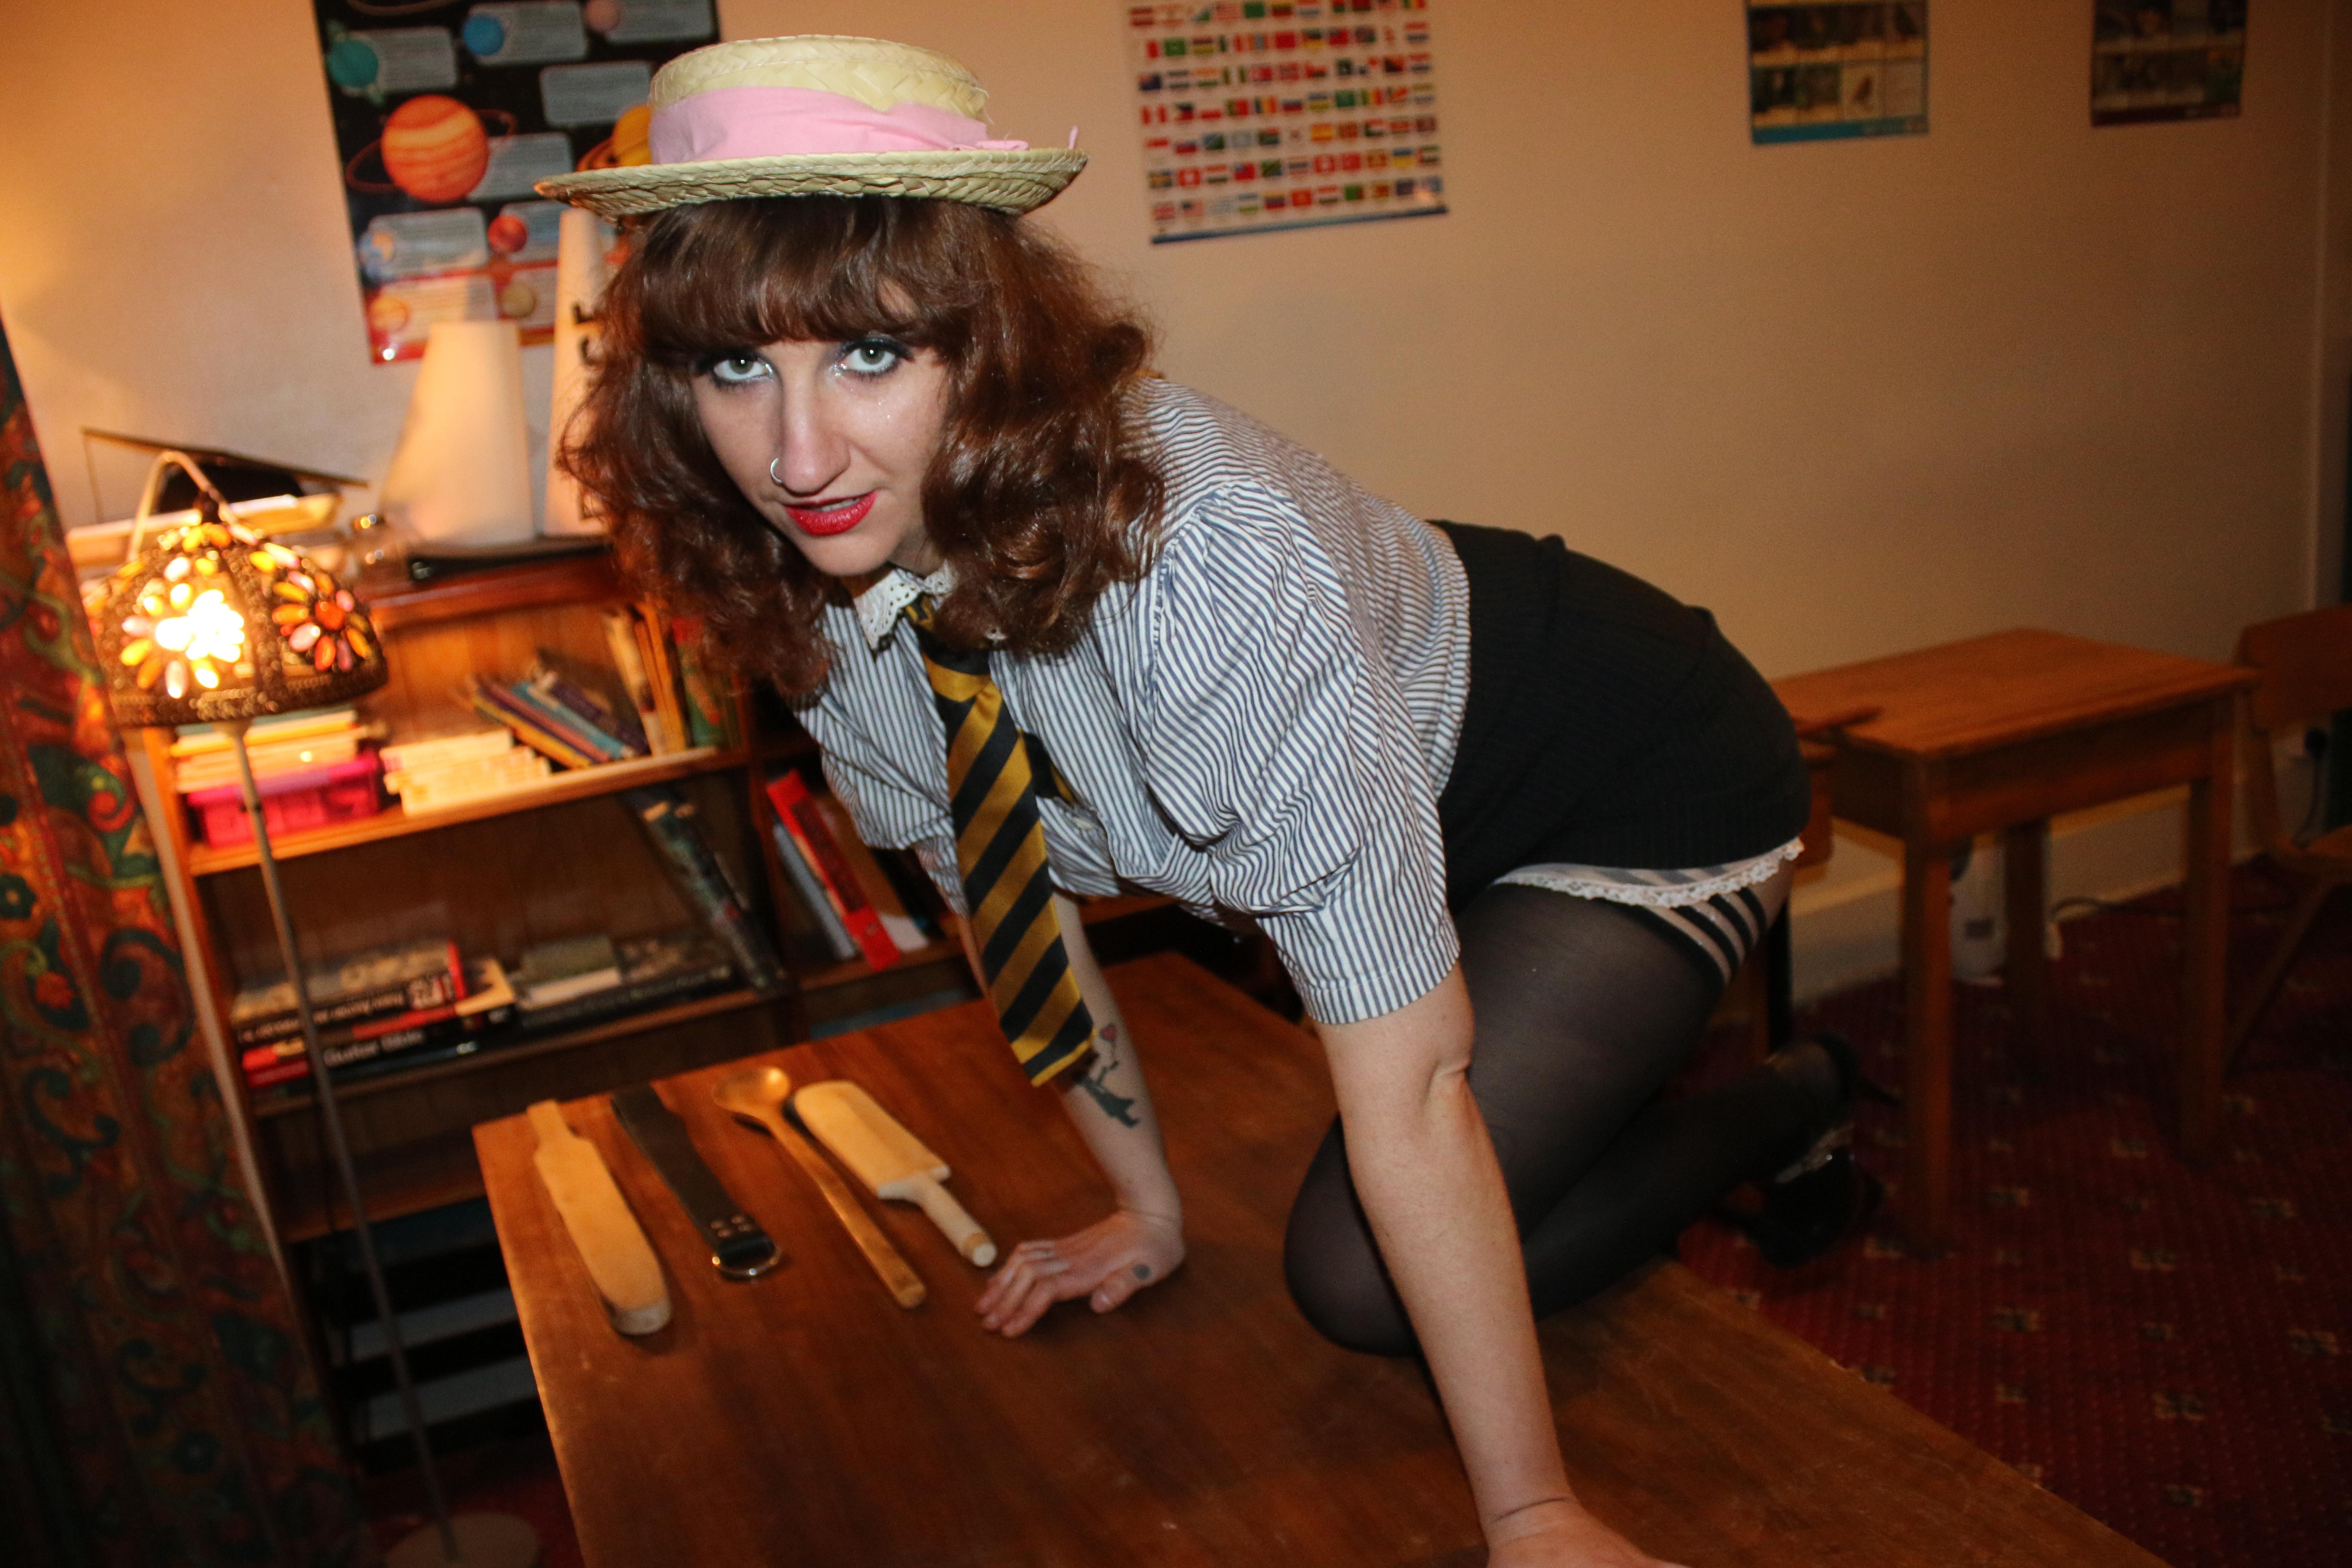 naughty girl climbing on the desk